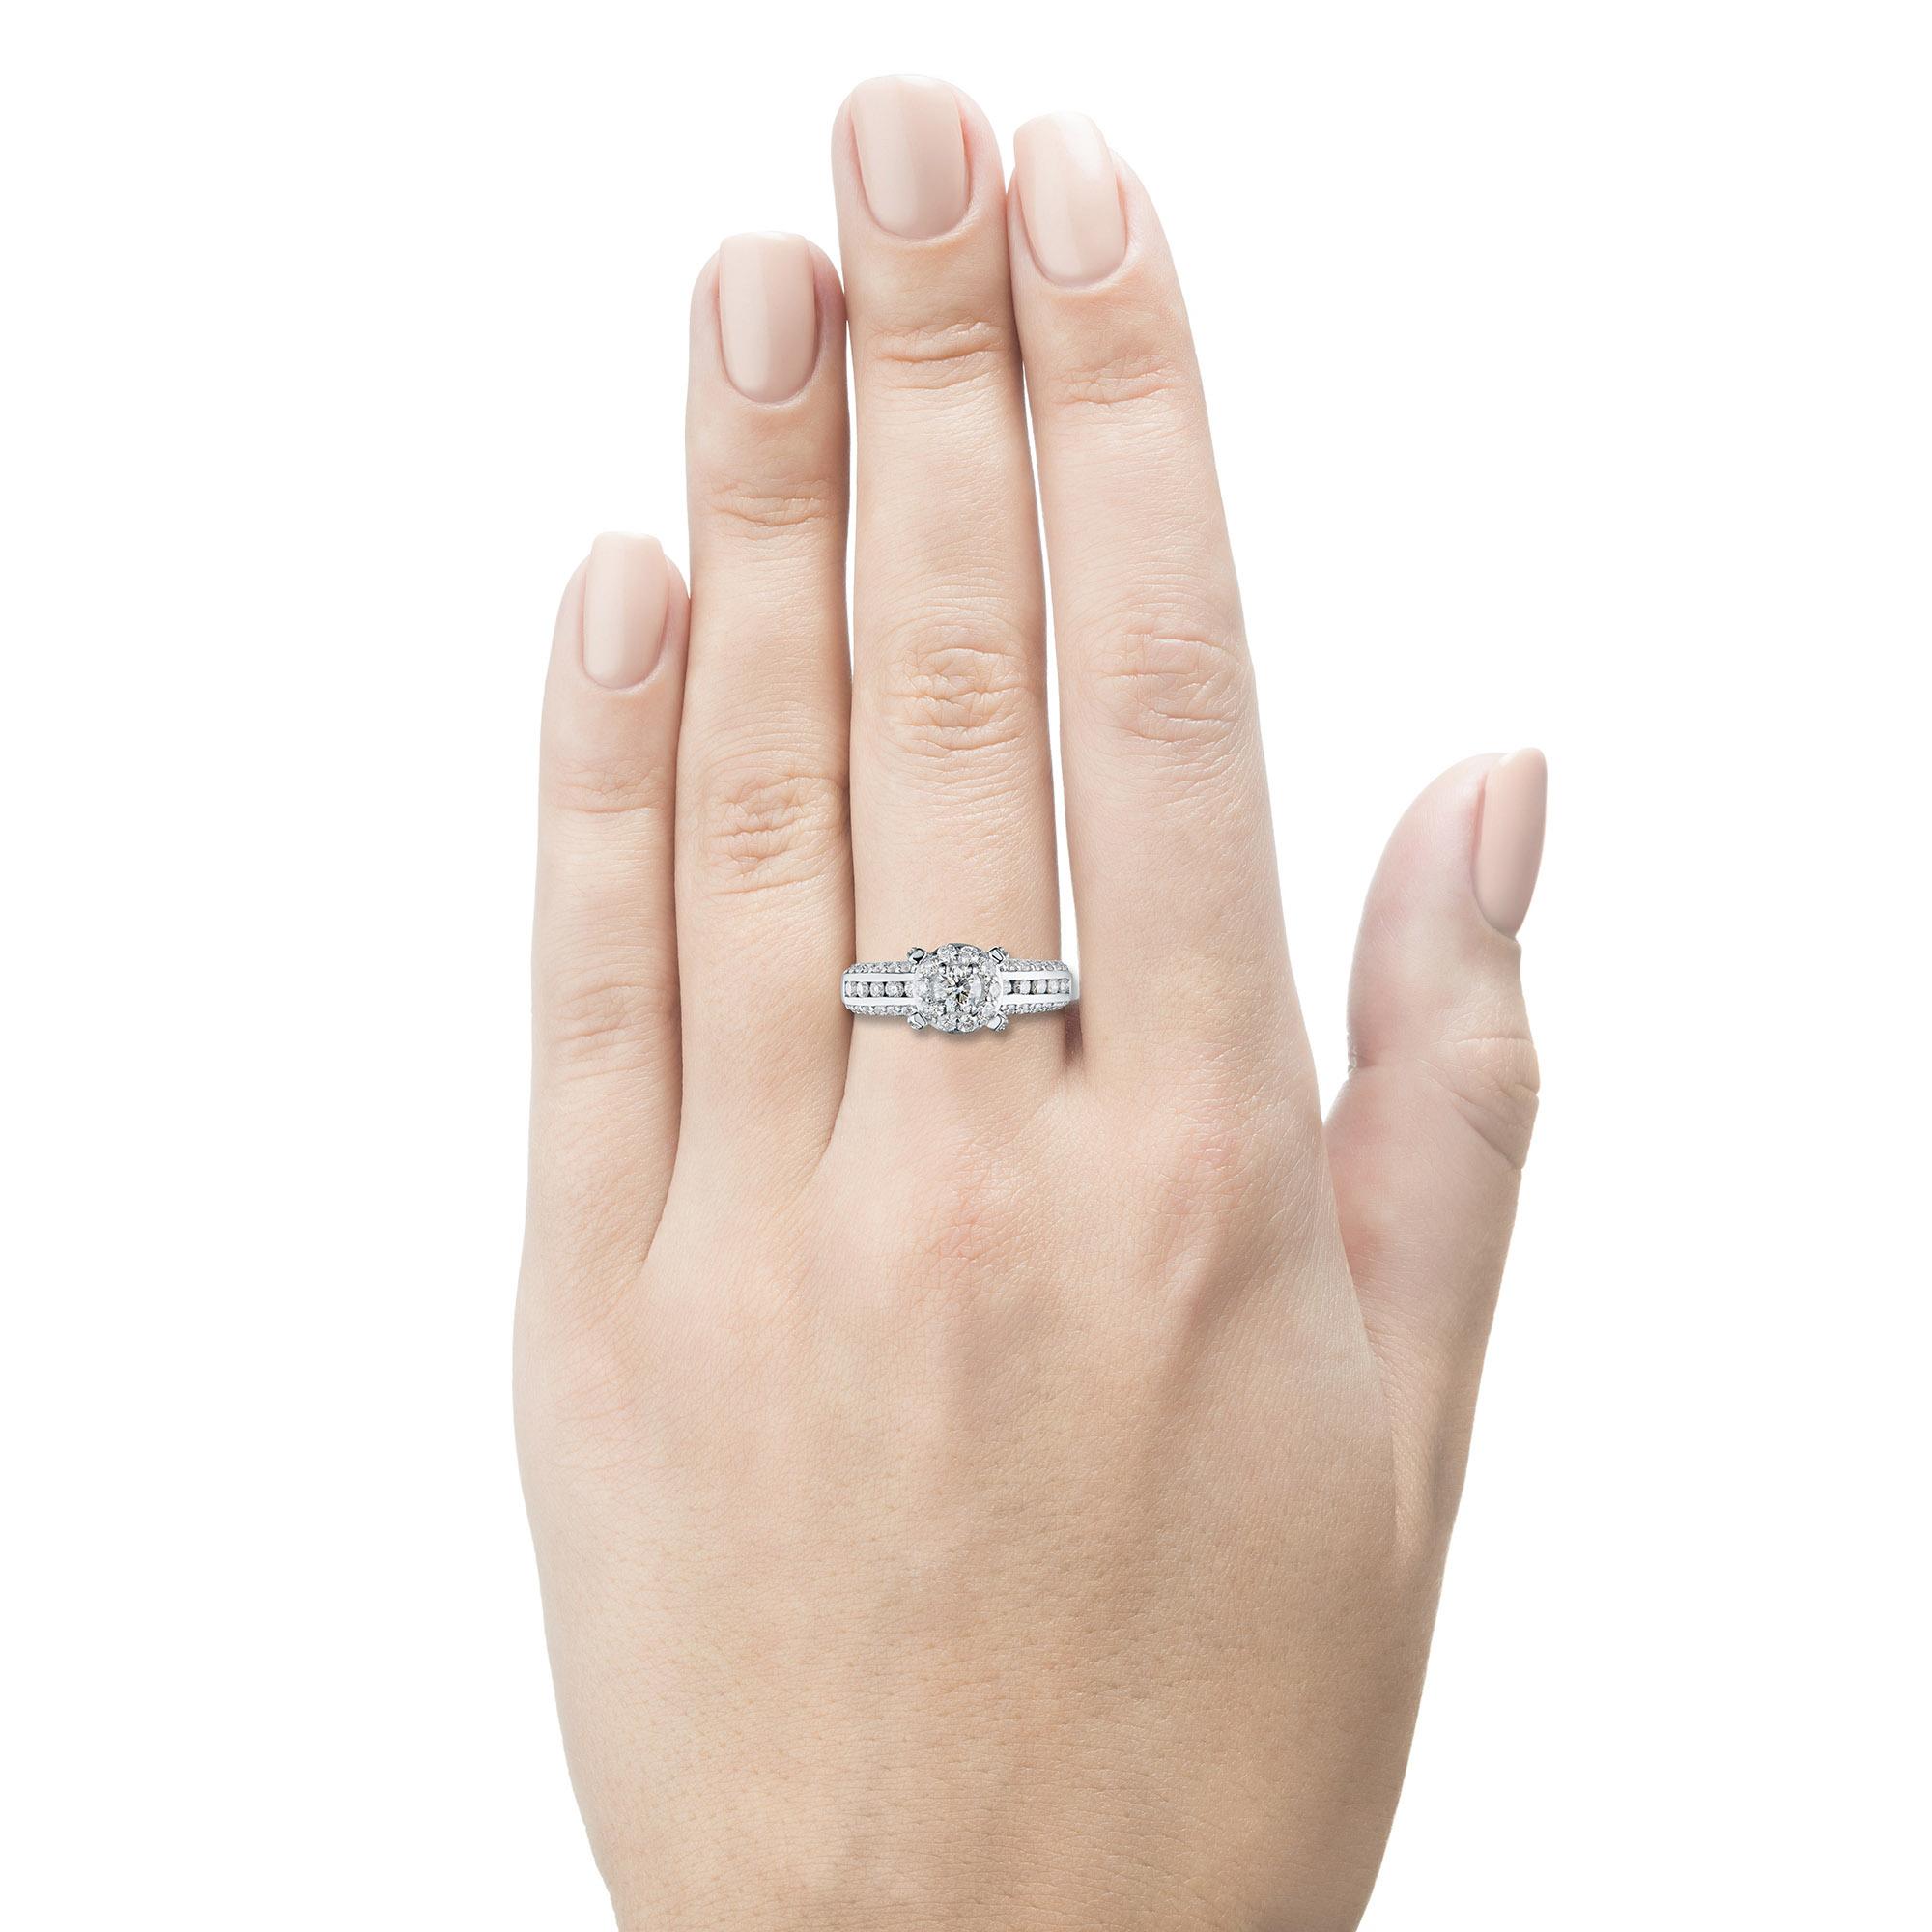 Кольцо из золота с бриллиантами э0901кц042103781